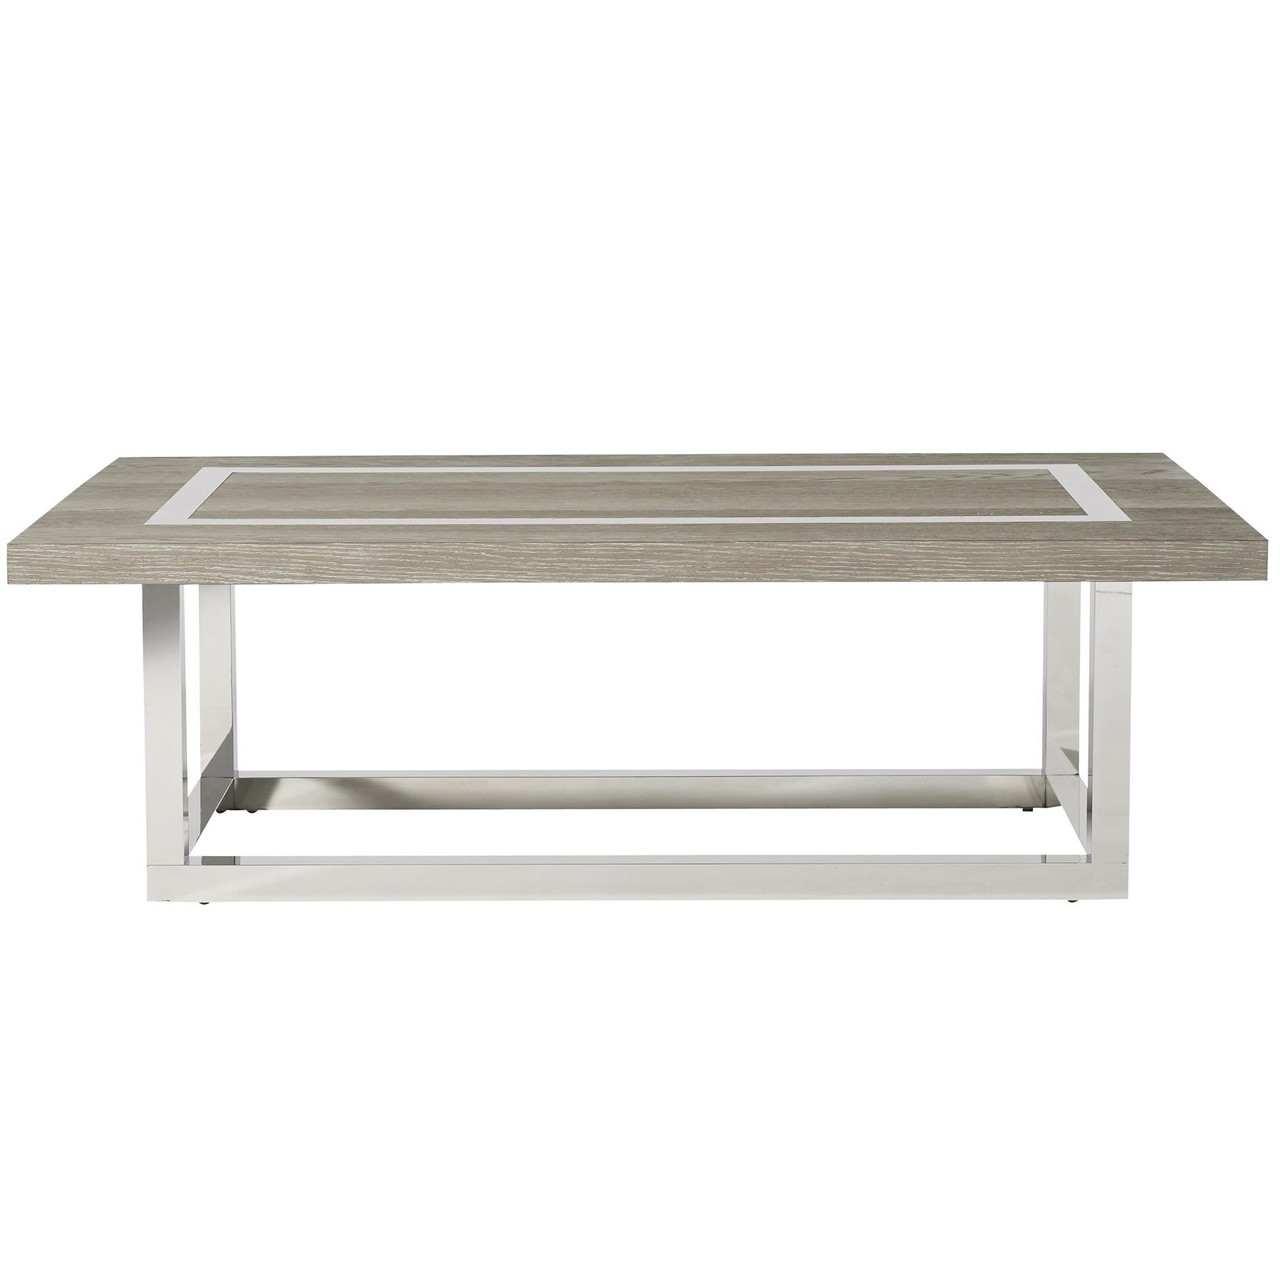 wyatt modern oak wood stainless steel cocktail table